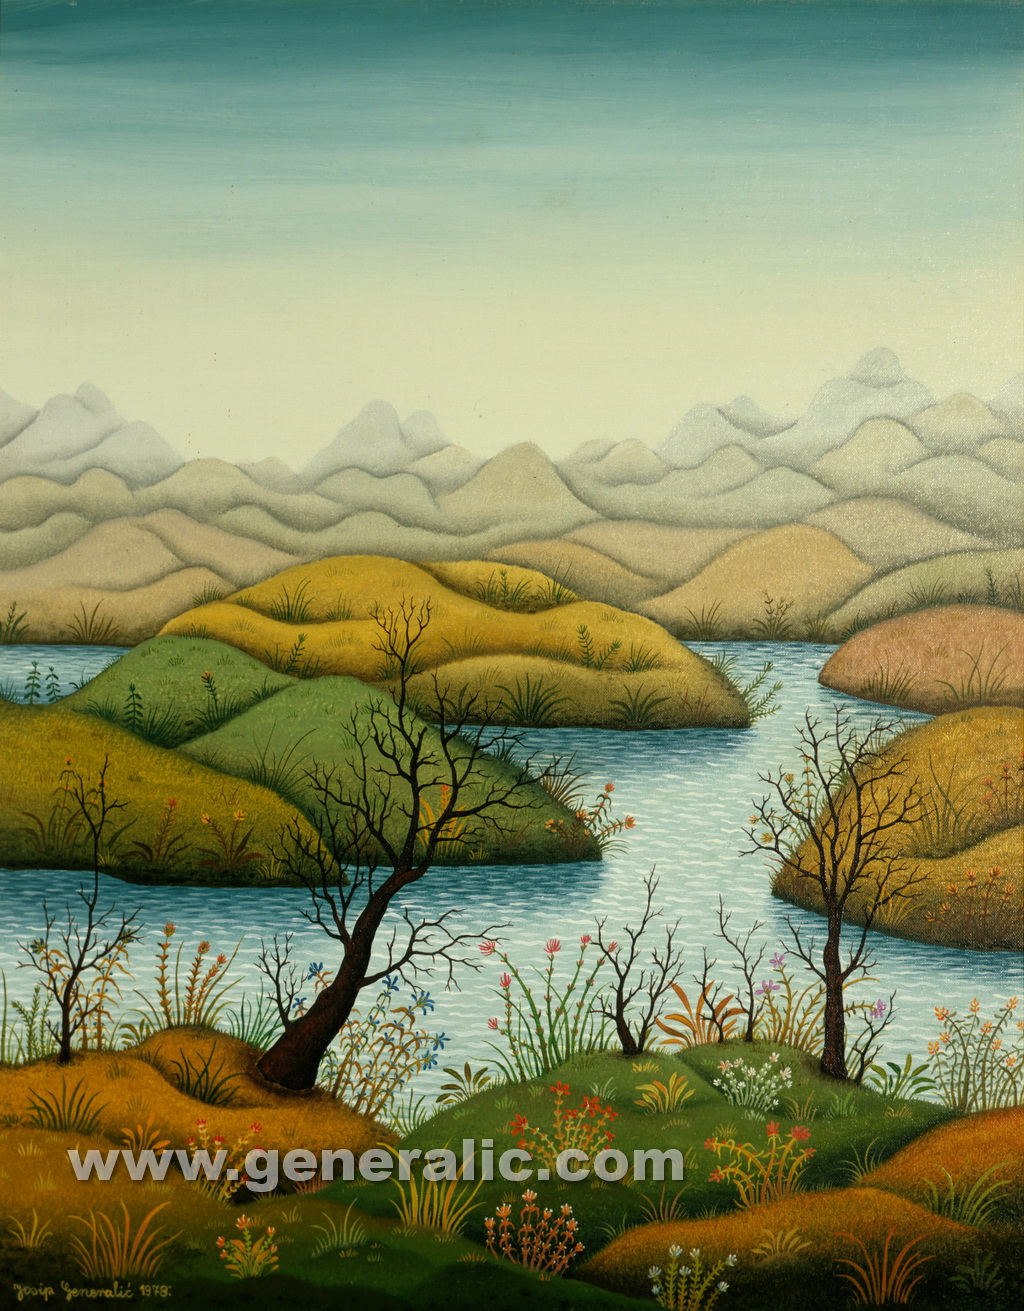 Josip Generalic, 1978, Landscape with river Drava, oil on canvas, 70x55 cm